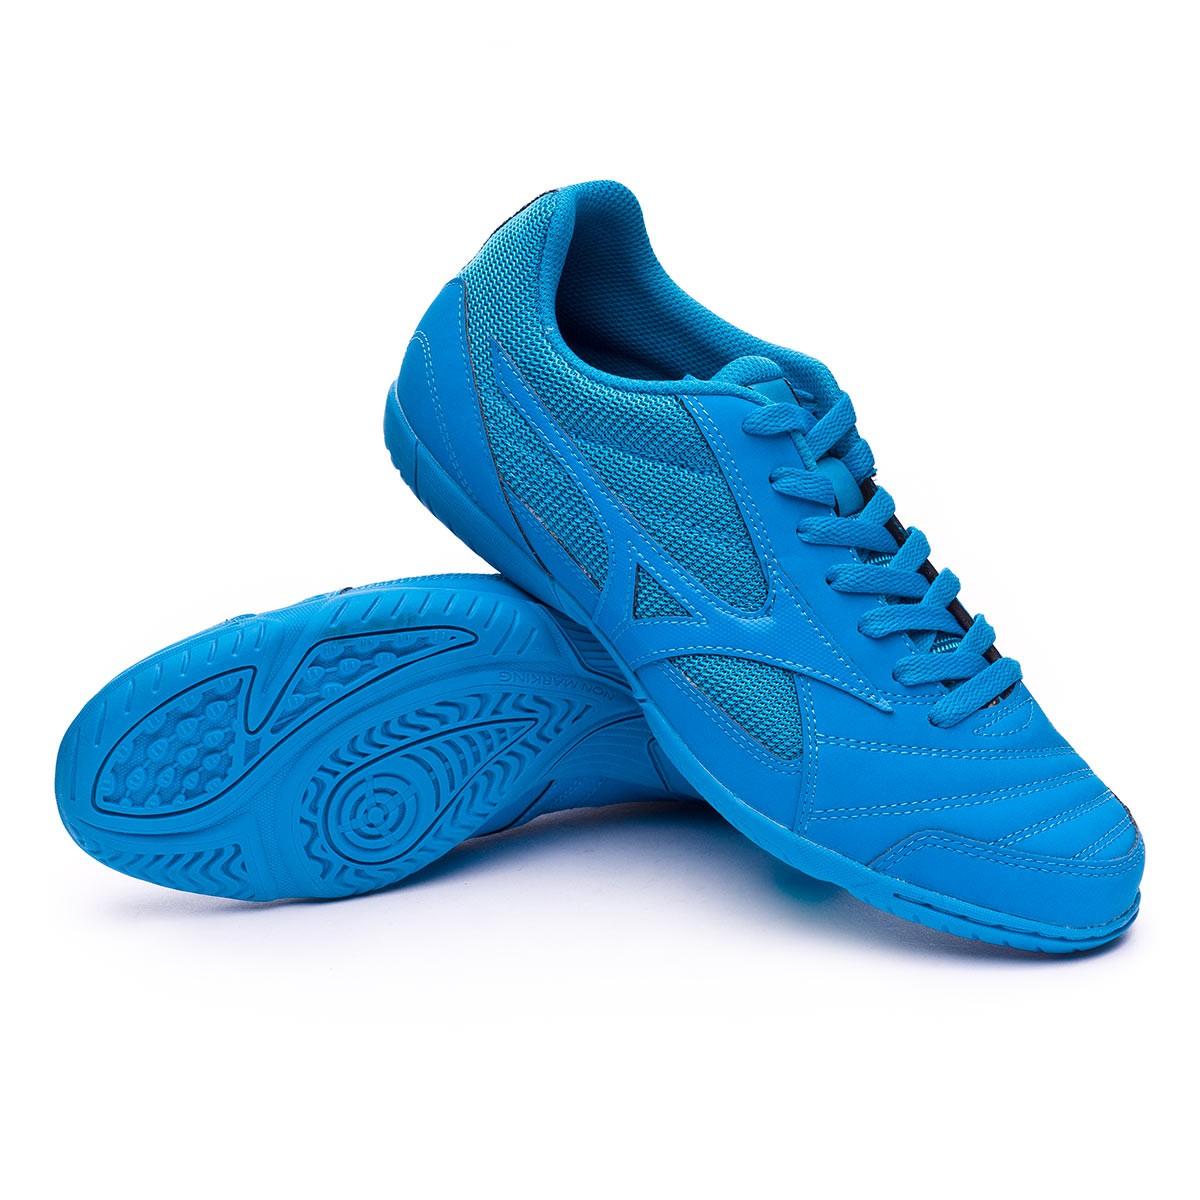 0b5a9b8578cc Futsal Boot Mizuno Sala Club 2 IN Blue jewel-Black - Football store Fútbol  Emotion